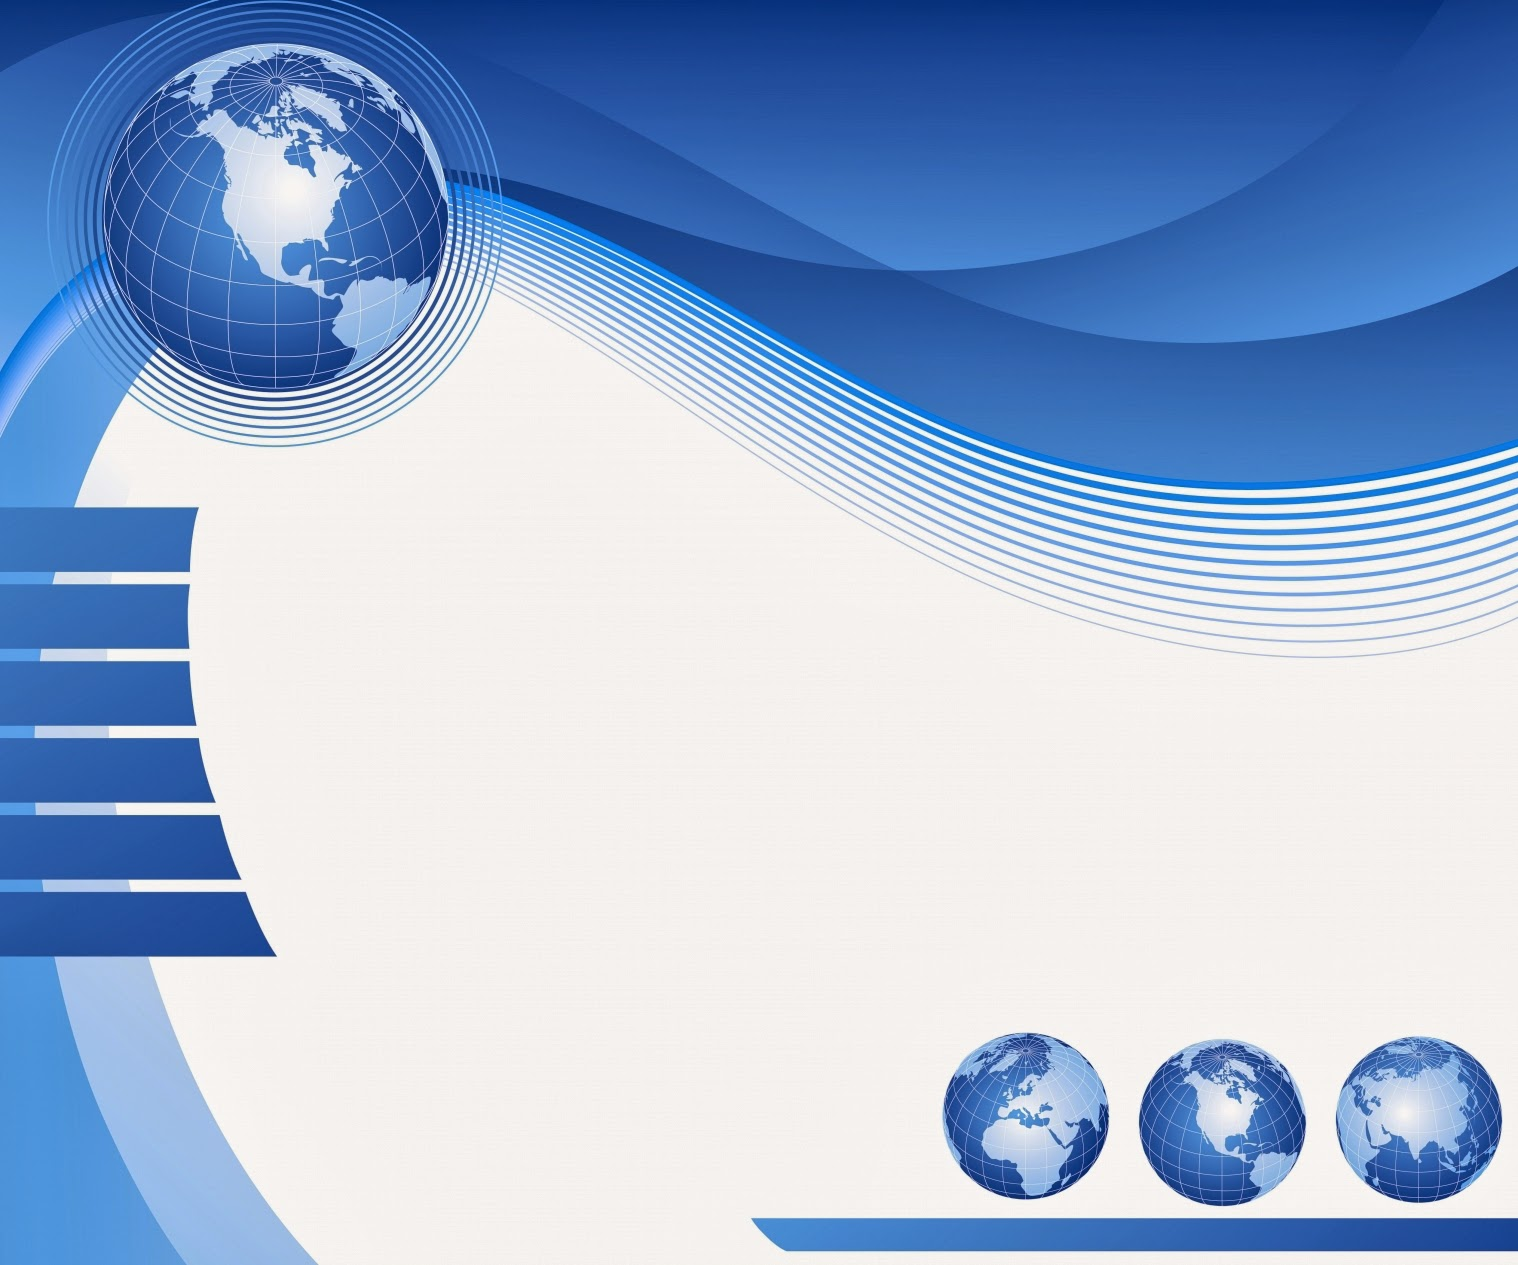 Download Kumpulan Materi Fisika Sma | newhairstylesformen2014.com